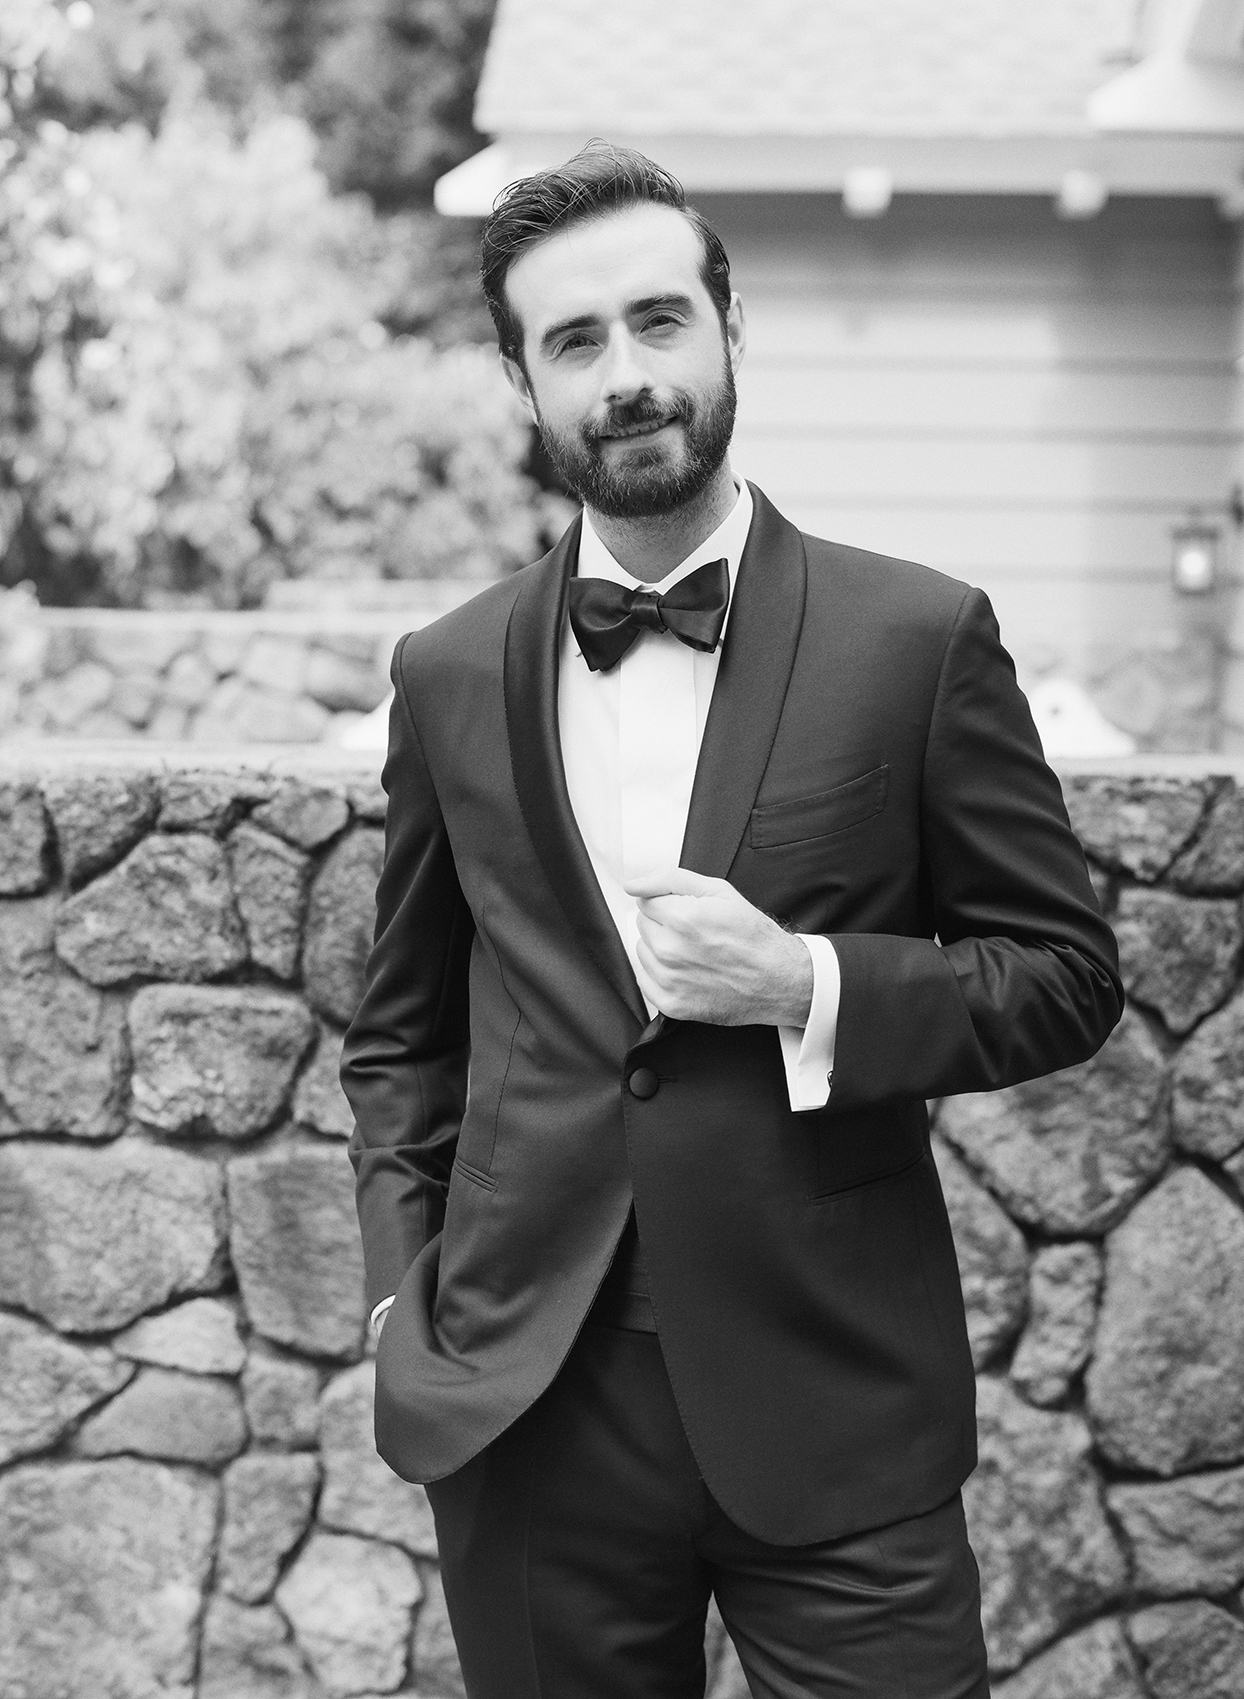 Groom in Brioni tuxedo with a shawl collar, a custom tuxedo shirt, a black bow tie, and a cummerbund